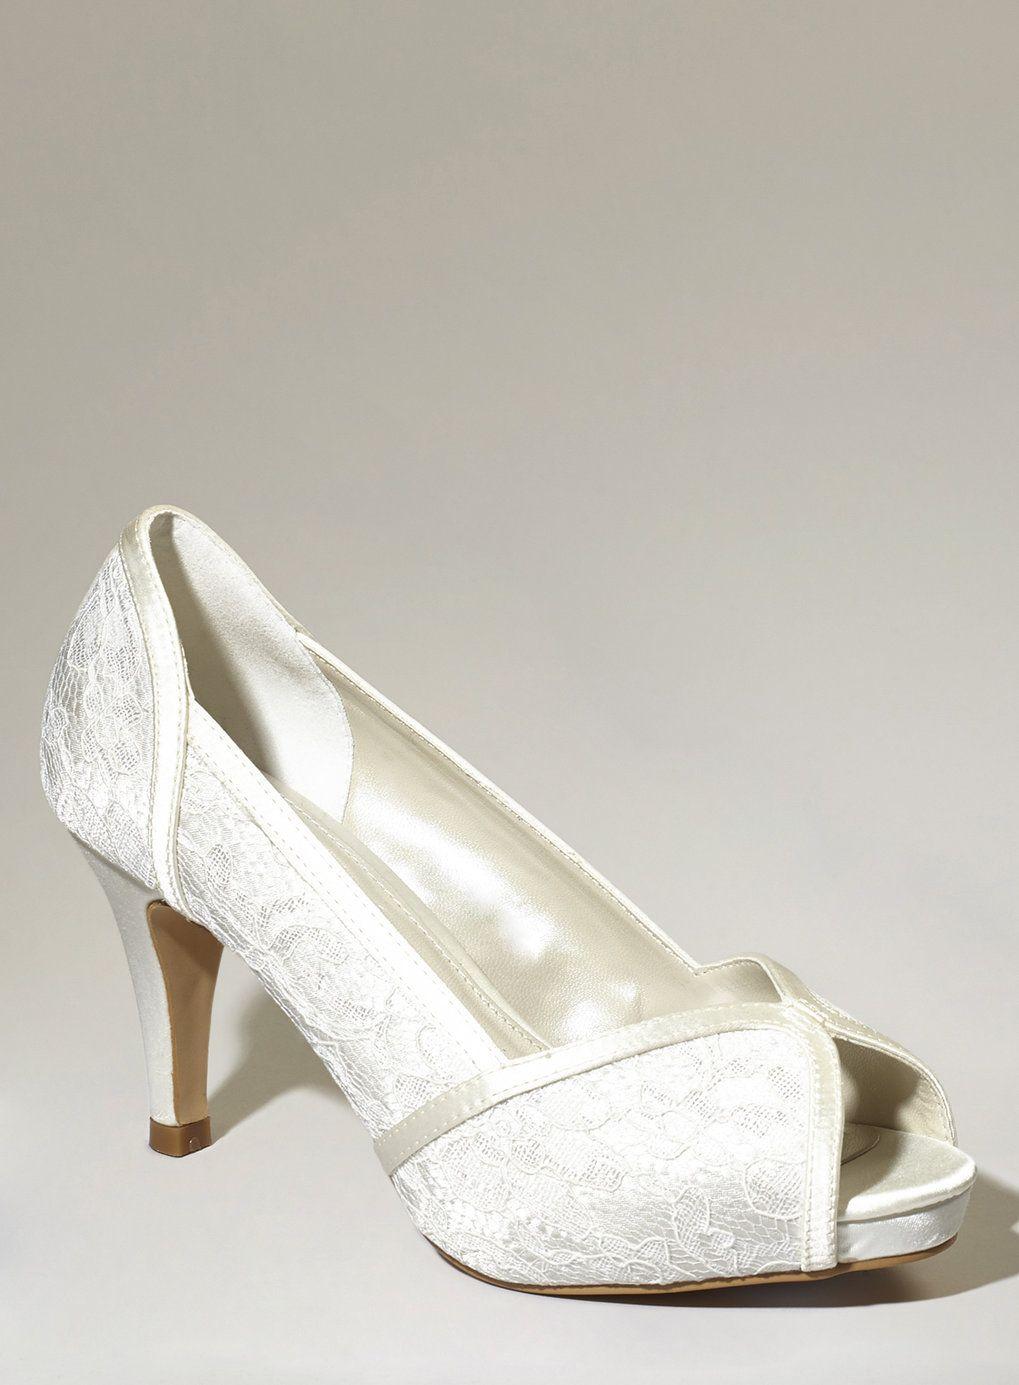 Ivory Fashion Wide Fit Da Vinci Lace Peep Toe Courts BHS